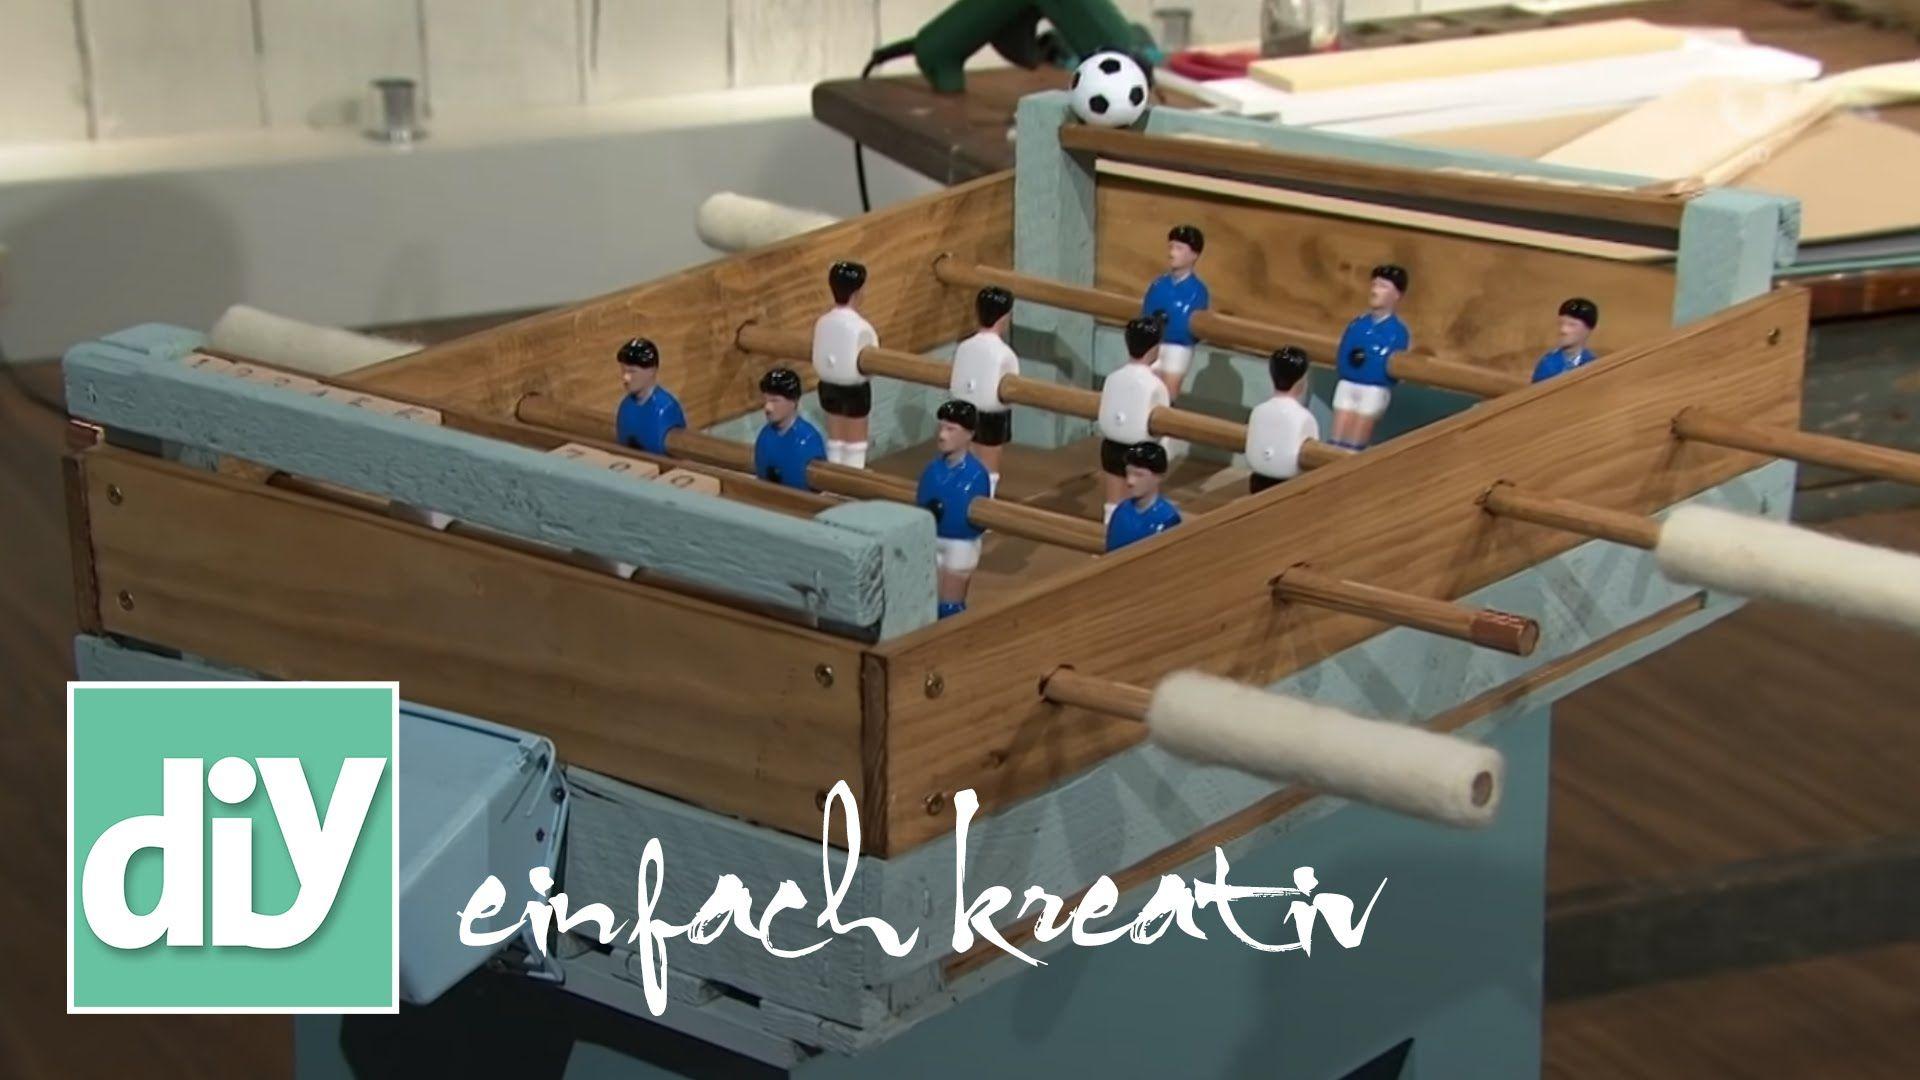 diy idee tischkicker aus holz ideen aus holz i tischfussball i upcycling i ideen aus kisten i. Black Bedroom Furniture Sets. Home Design Ideas